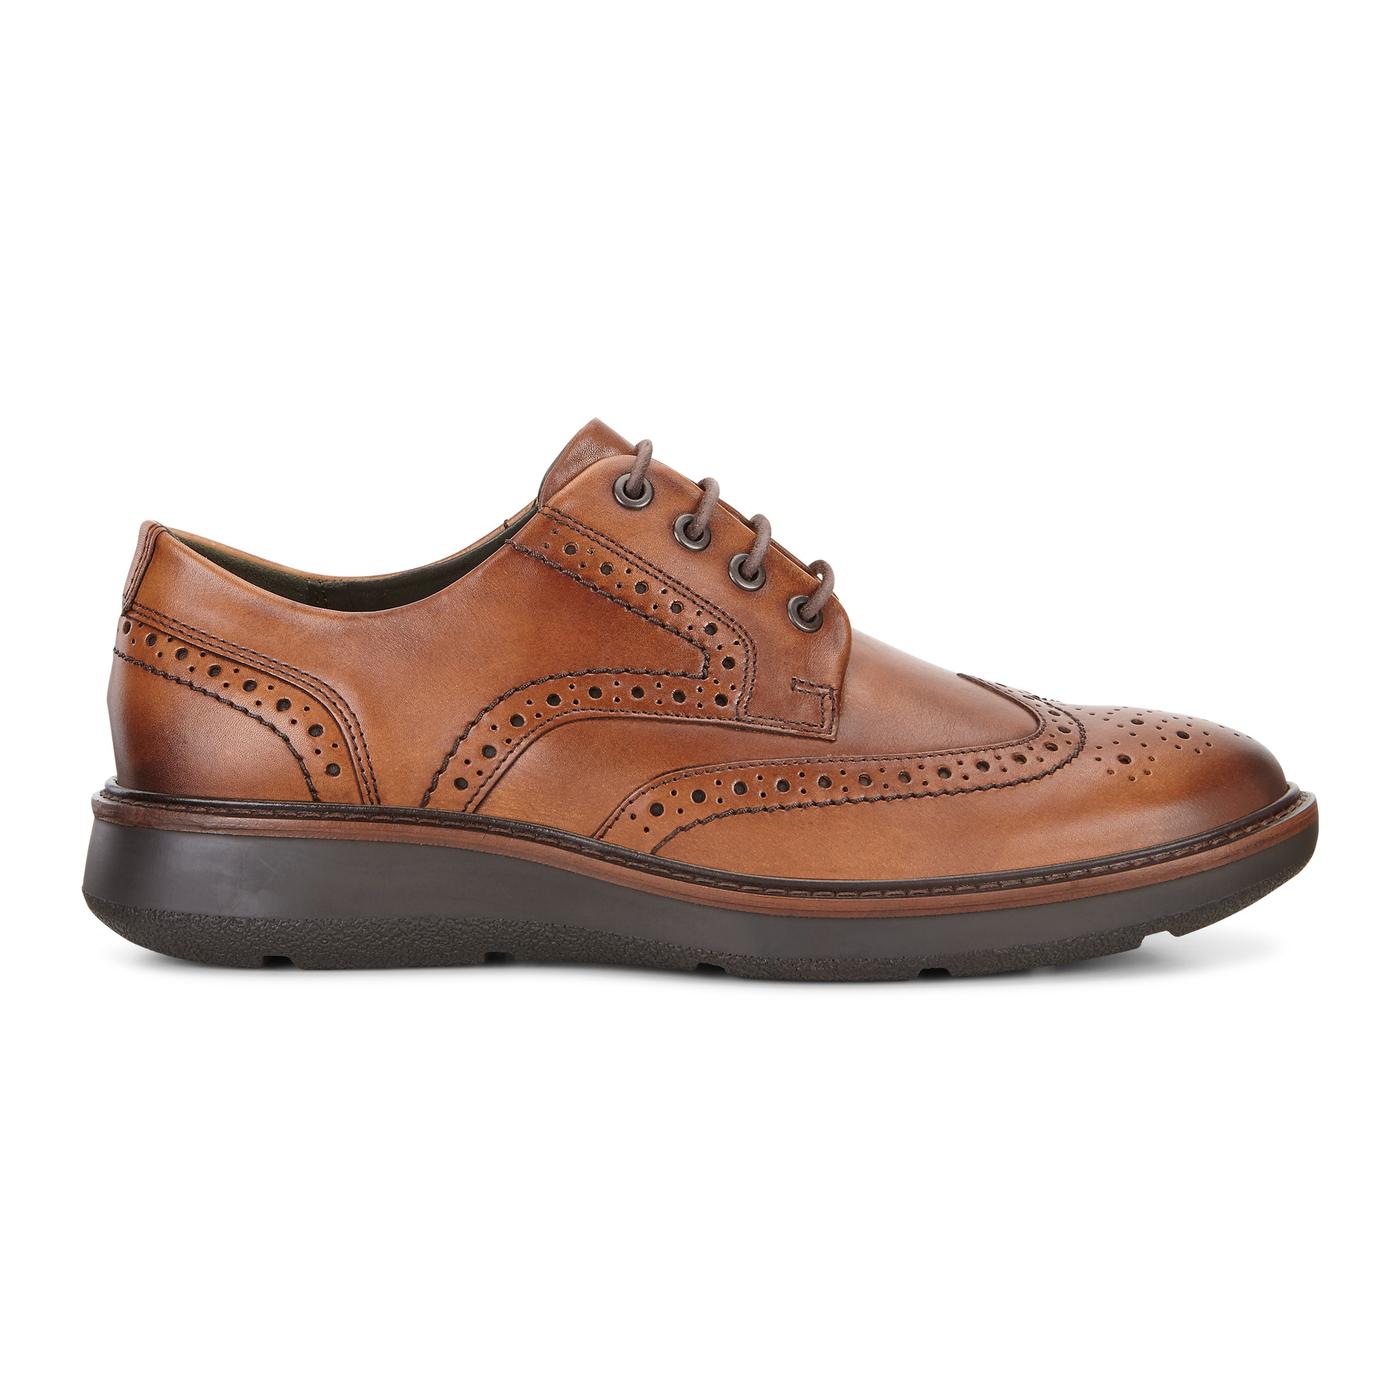 ECCO LHASA Shoe